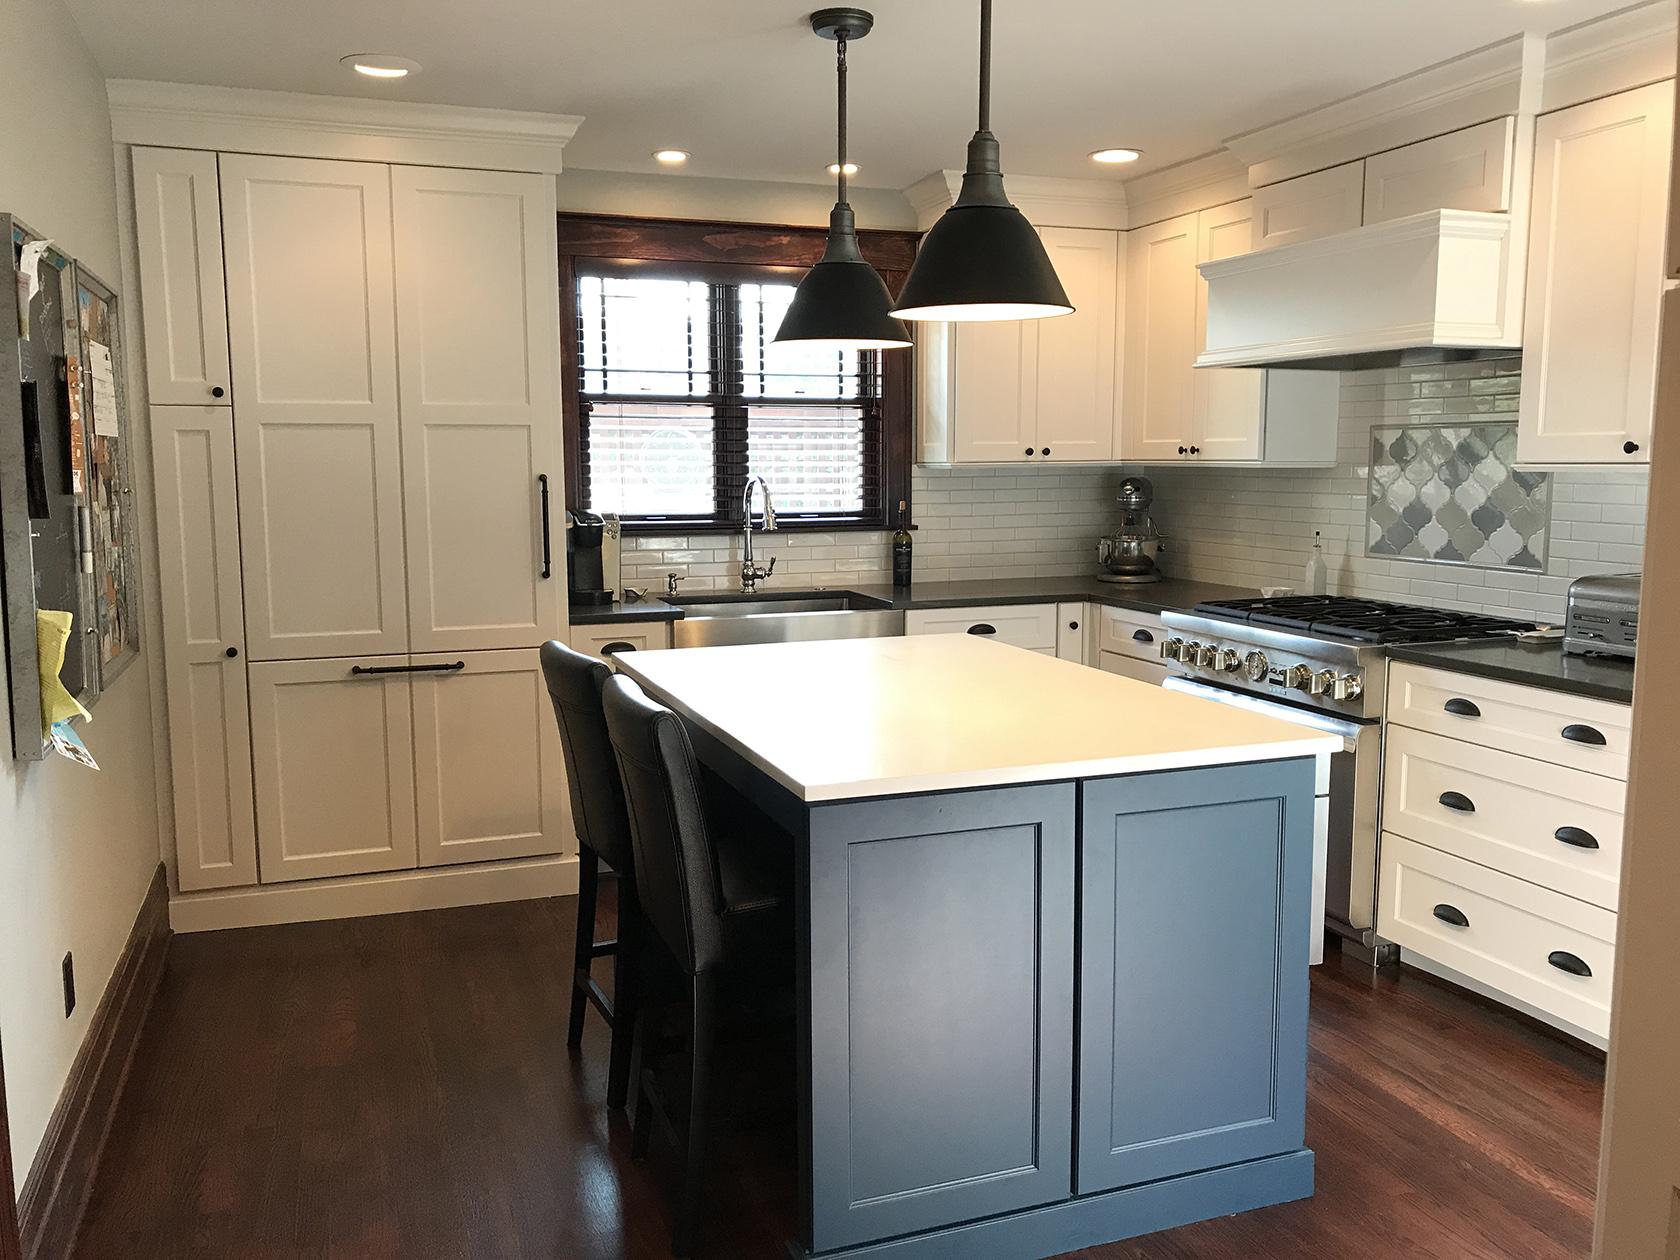 kitchen remodeling birmingham mi cabinet door replacement lowes 2 phase remodel mainstreet design build